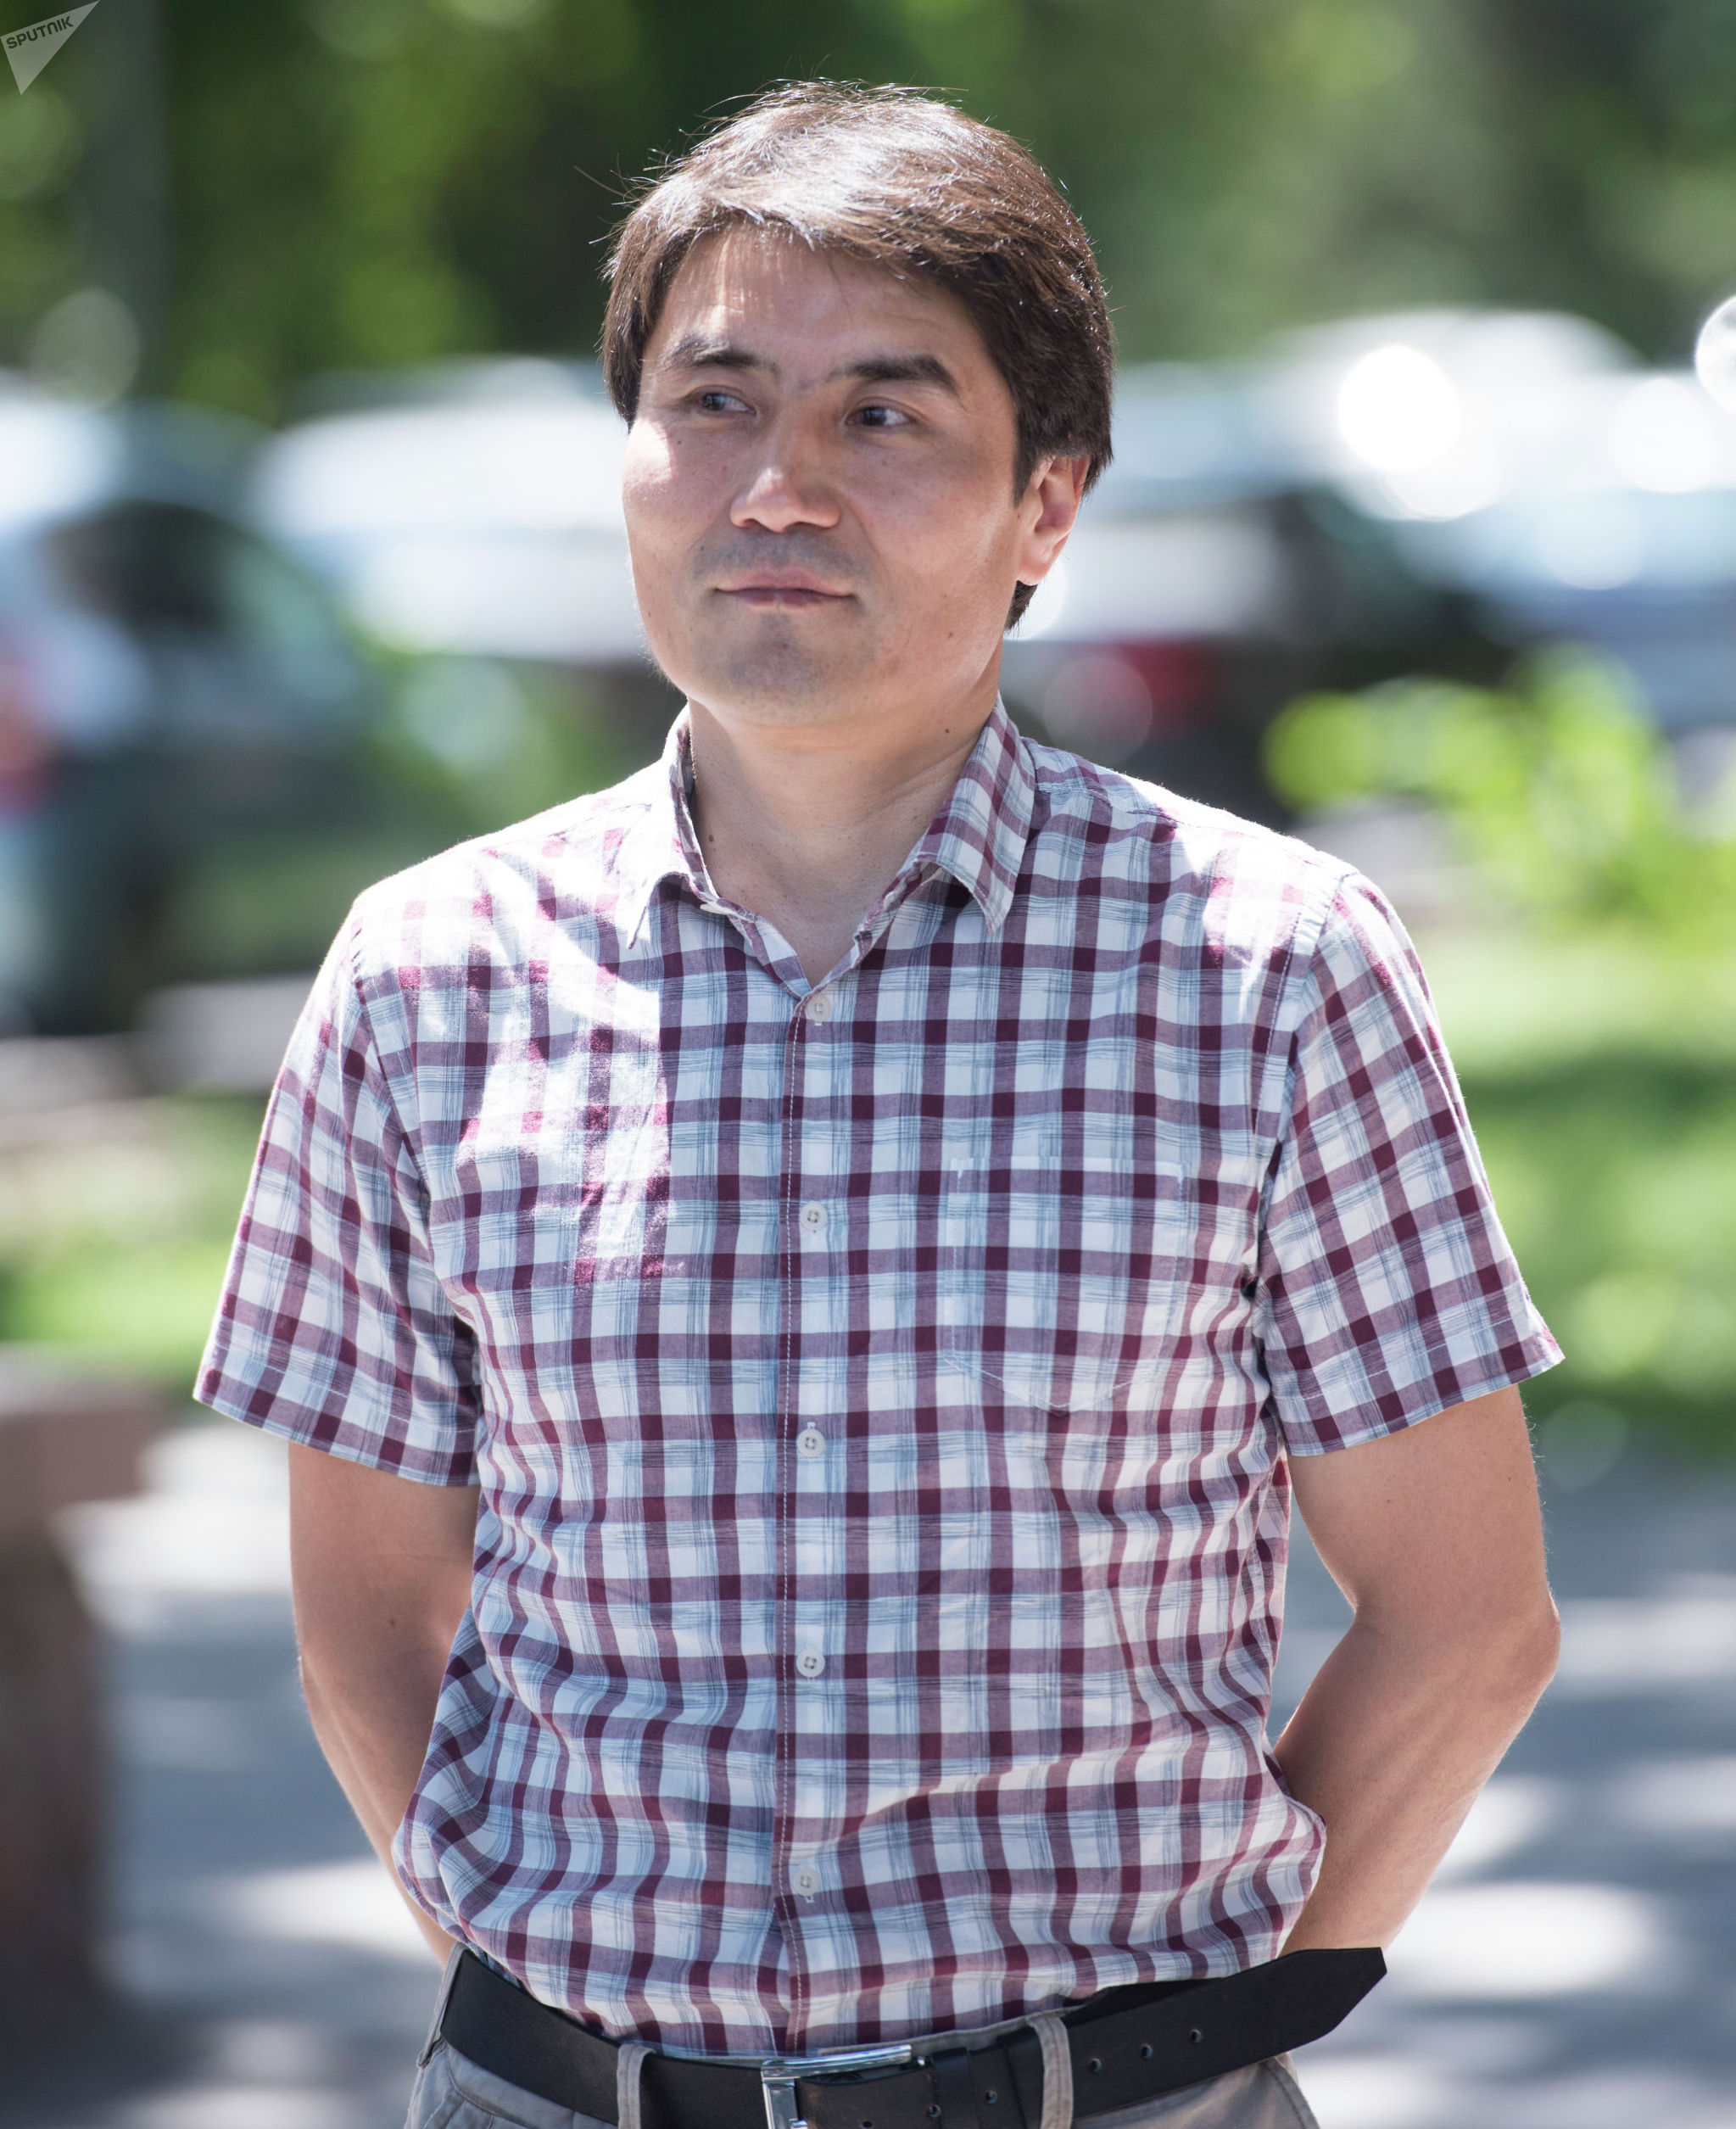 Руководитель пресс-службы Жогорку Кенеша Ибраим Нуракун уулу